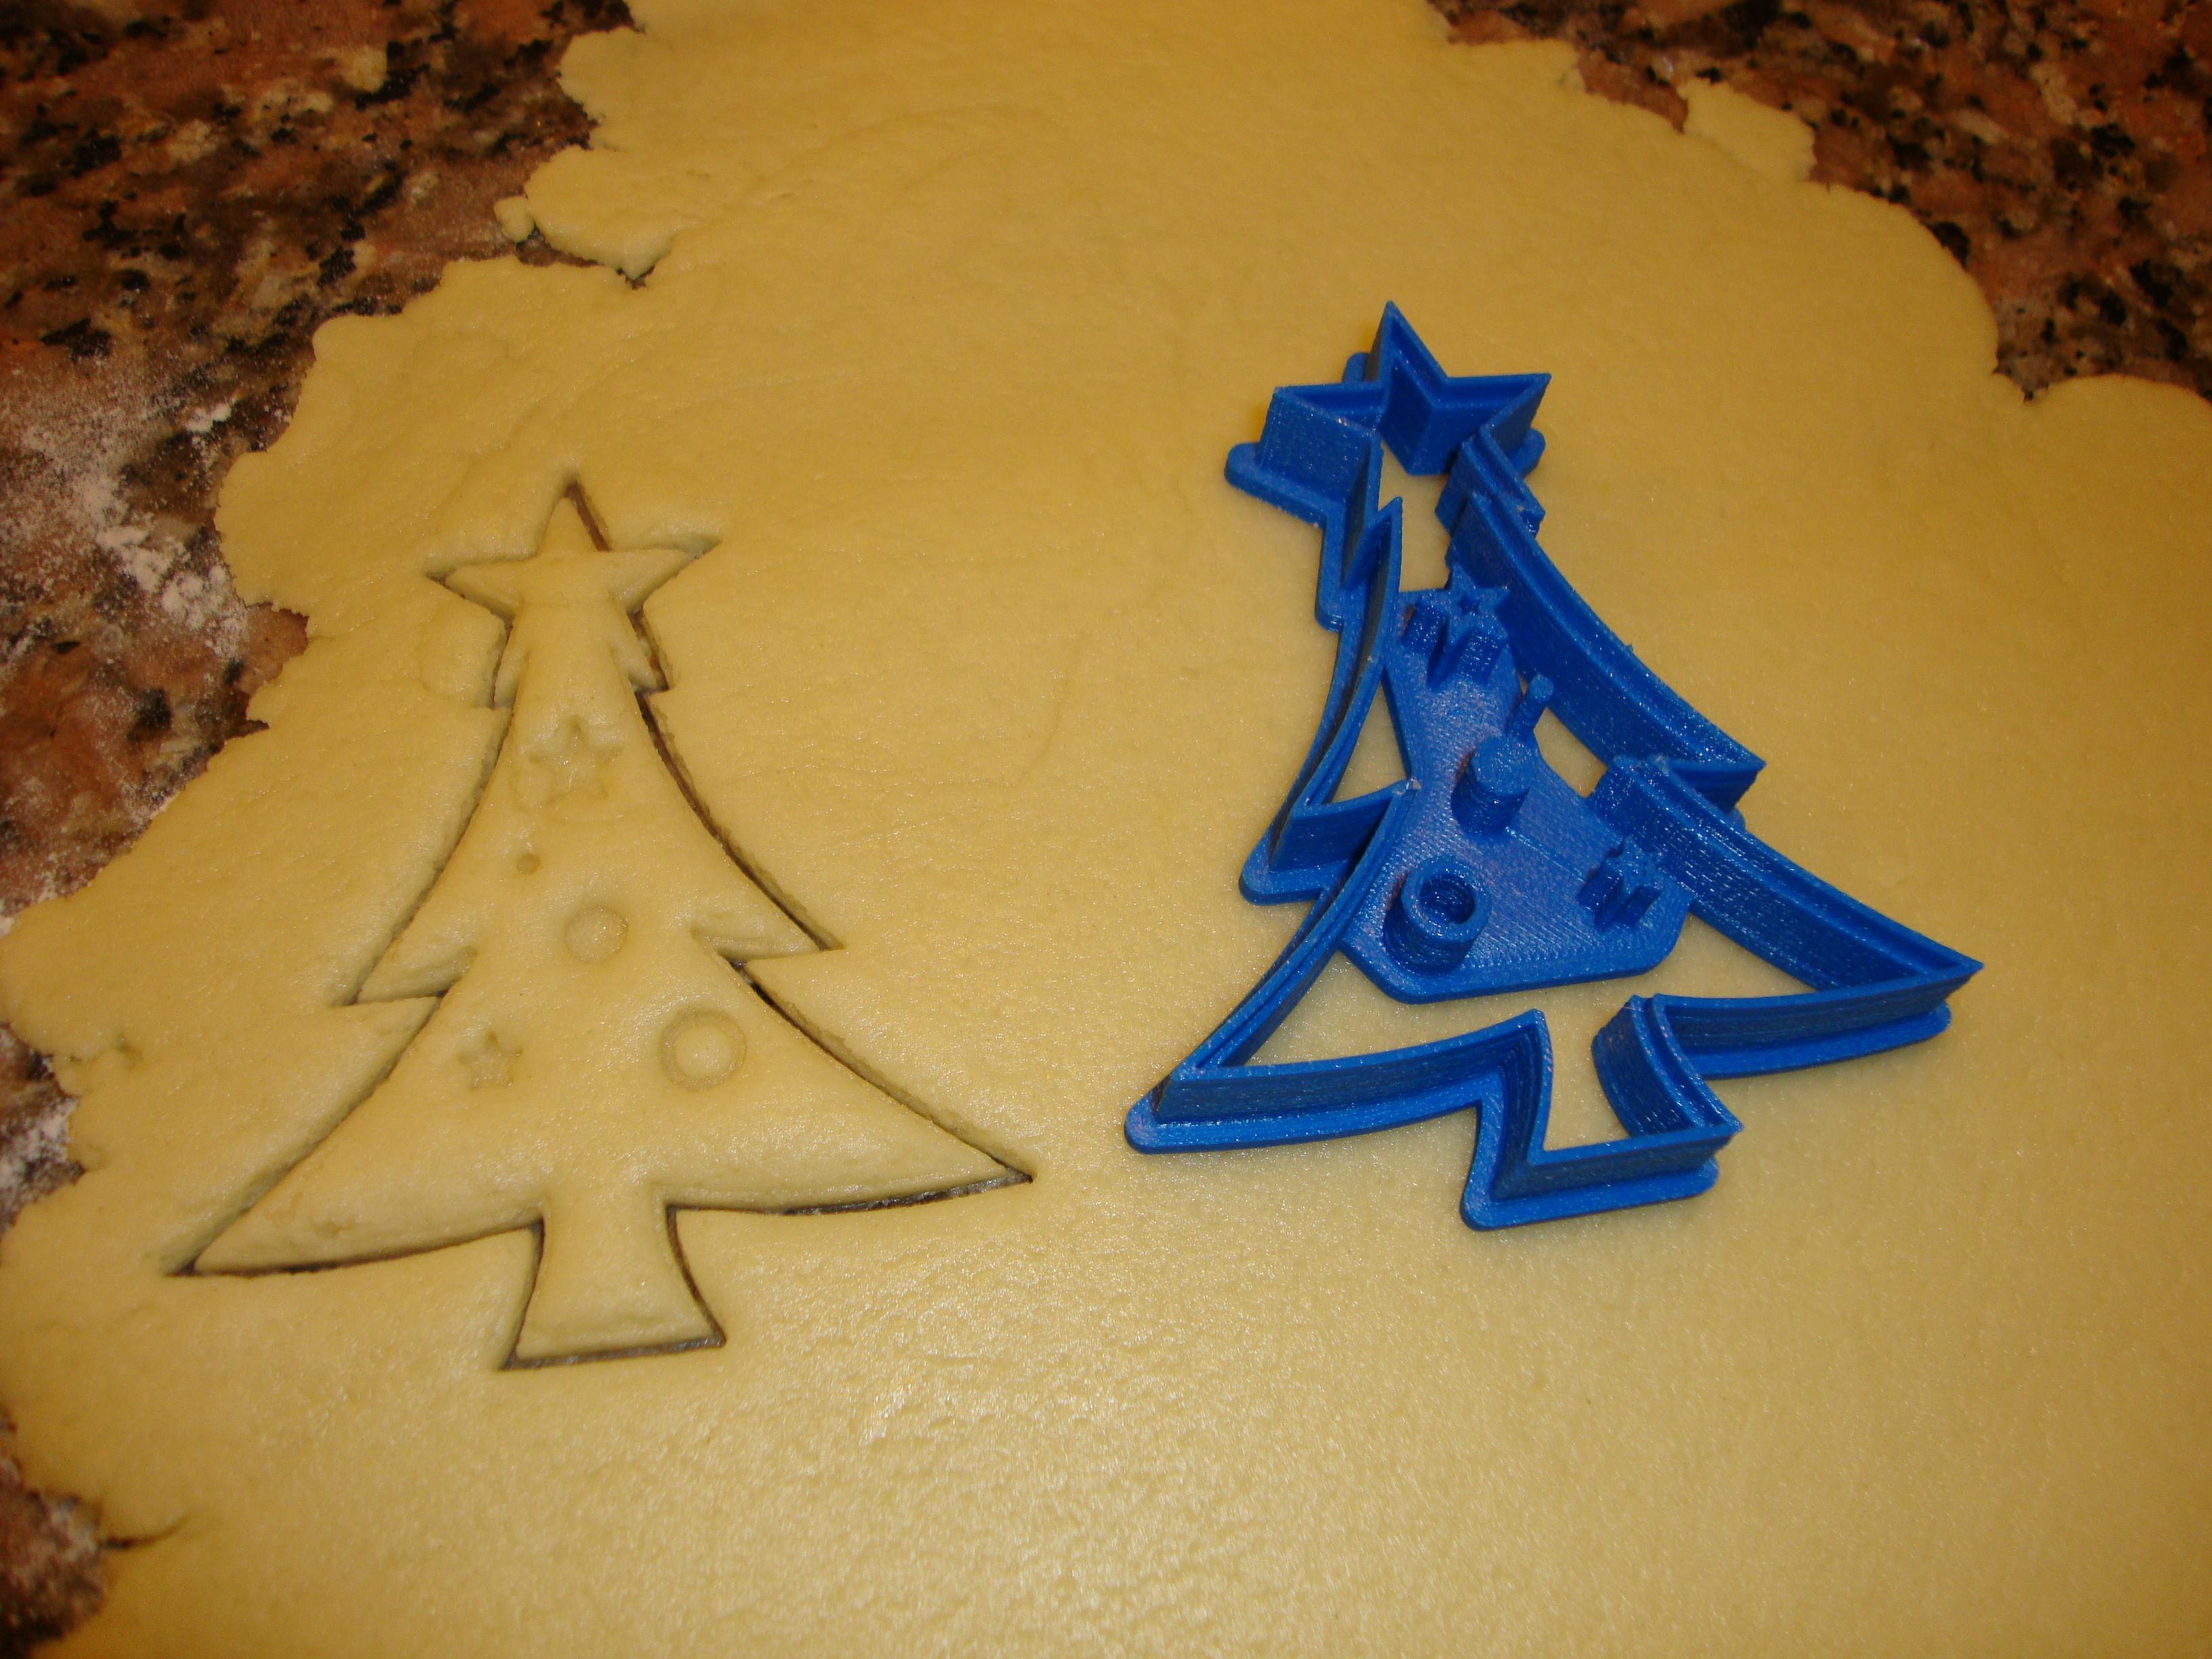 DSC04551.JPG Download STL file Cookie Cutter Christmas Tree • 3D printer template, Kukens